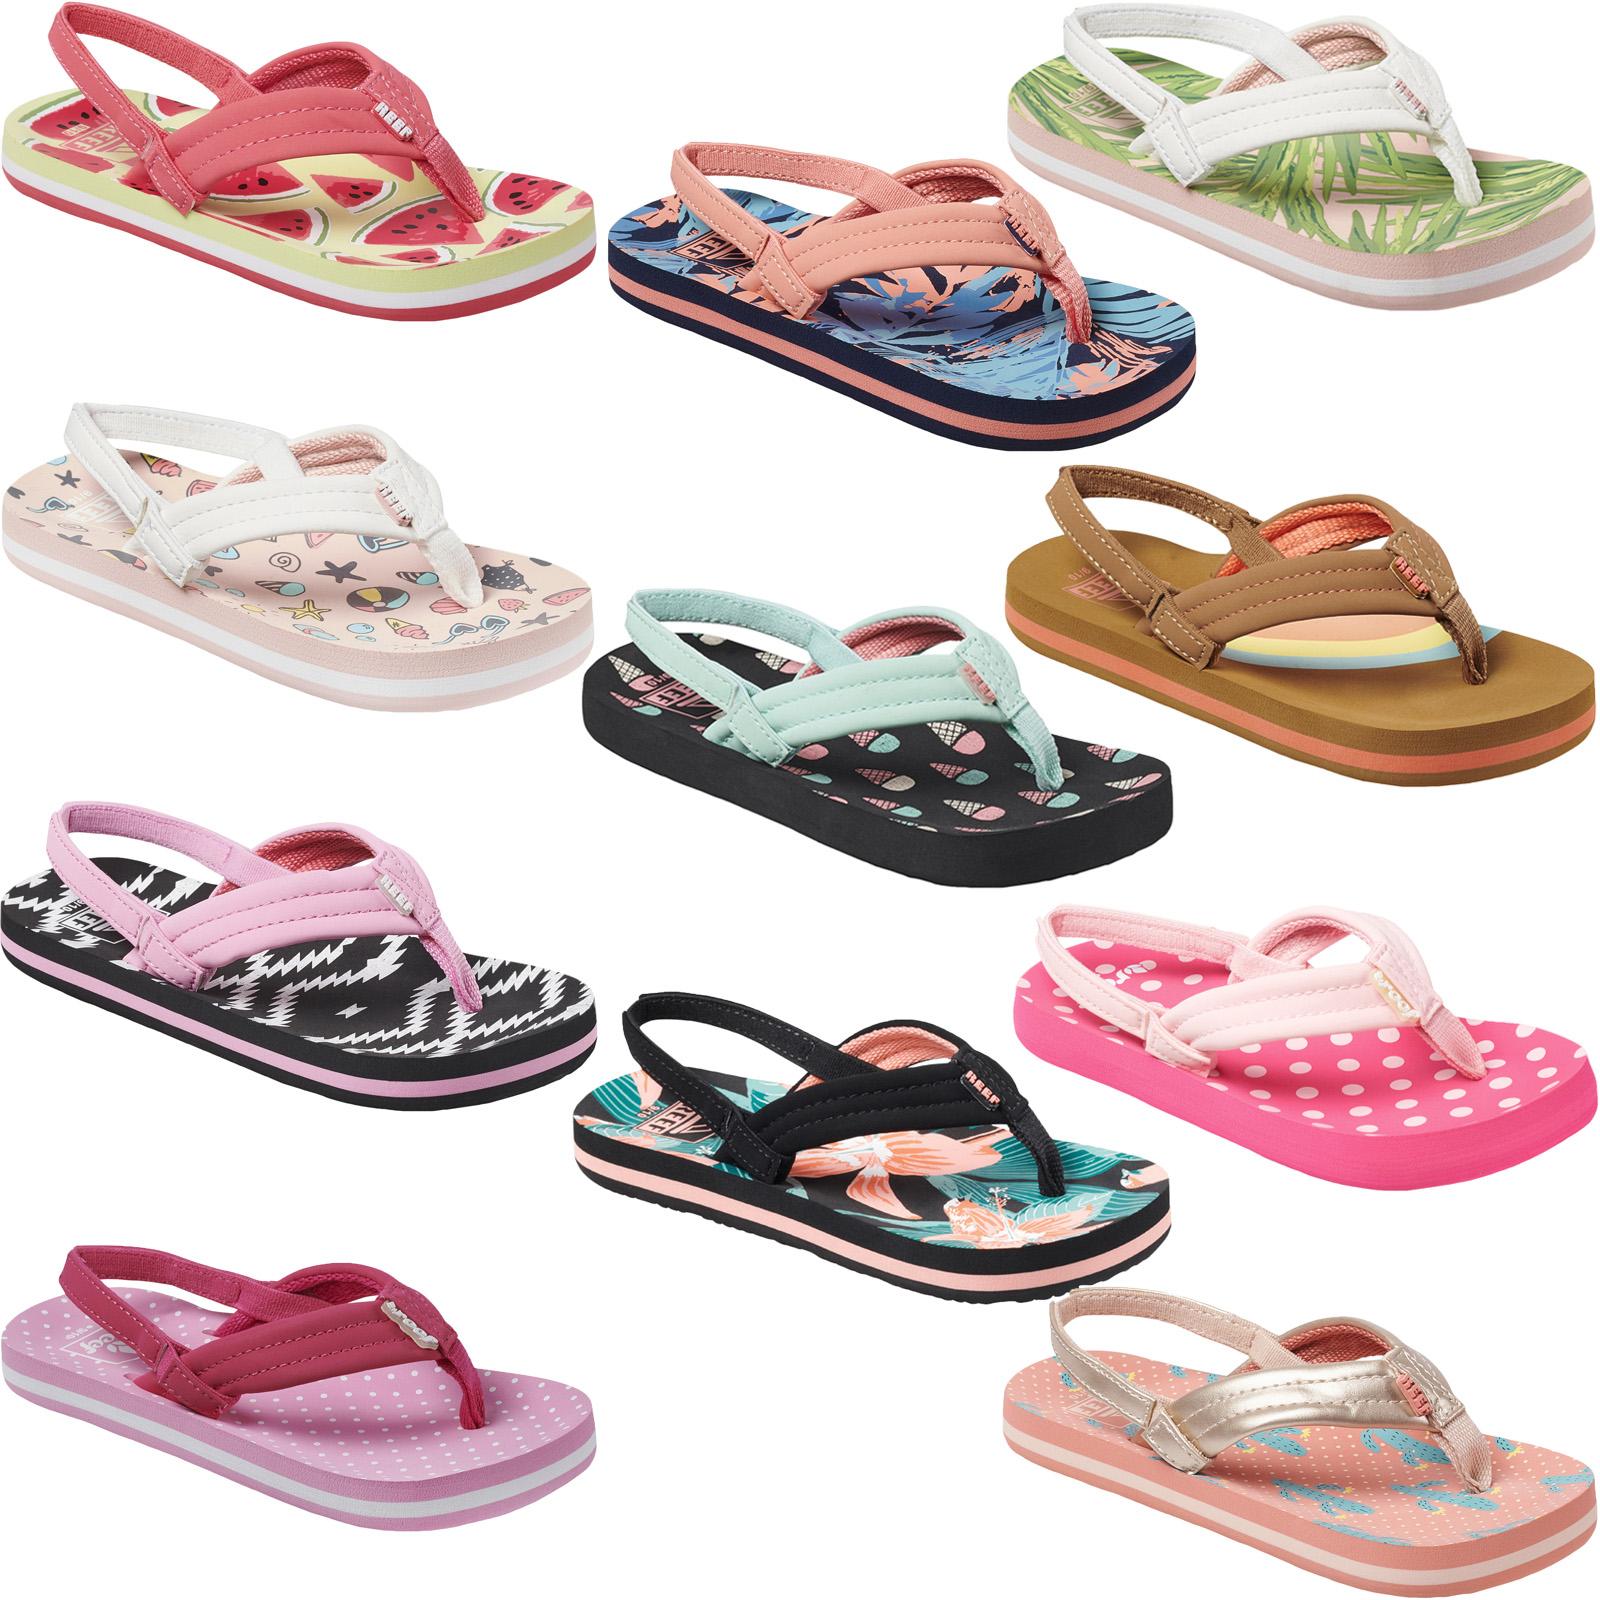 Reef Kids Girls Little AHI Convertible Rainbow Activity Sandals Size